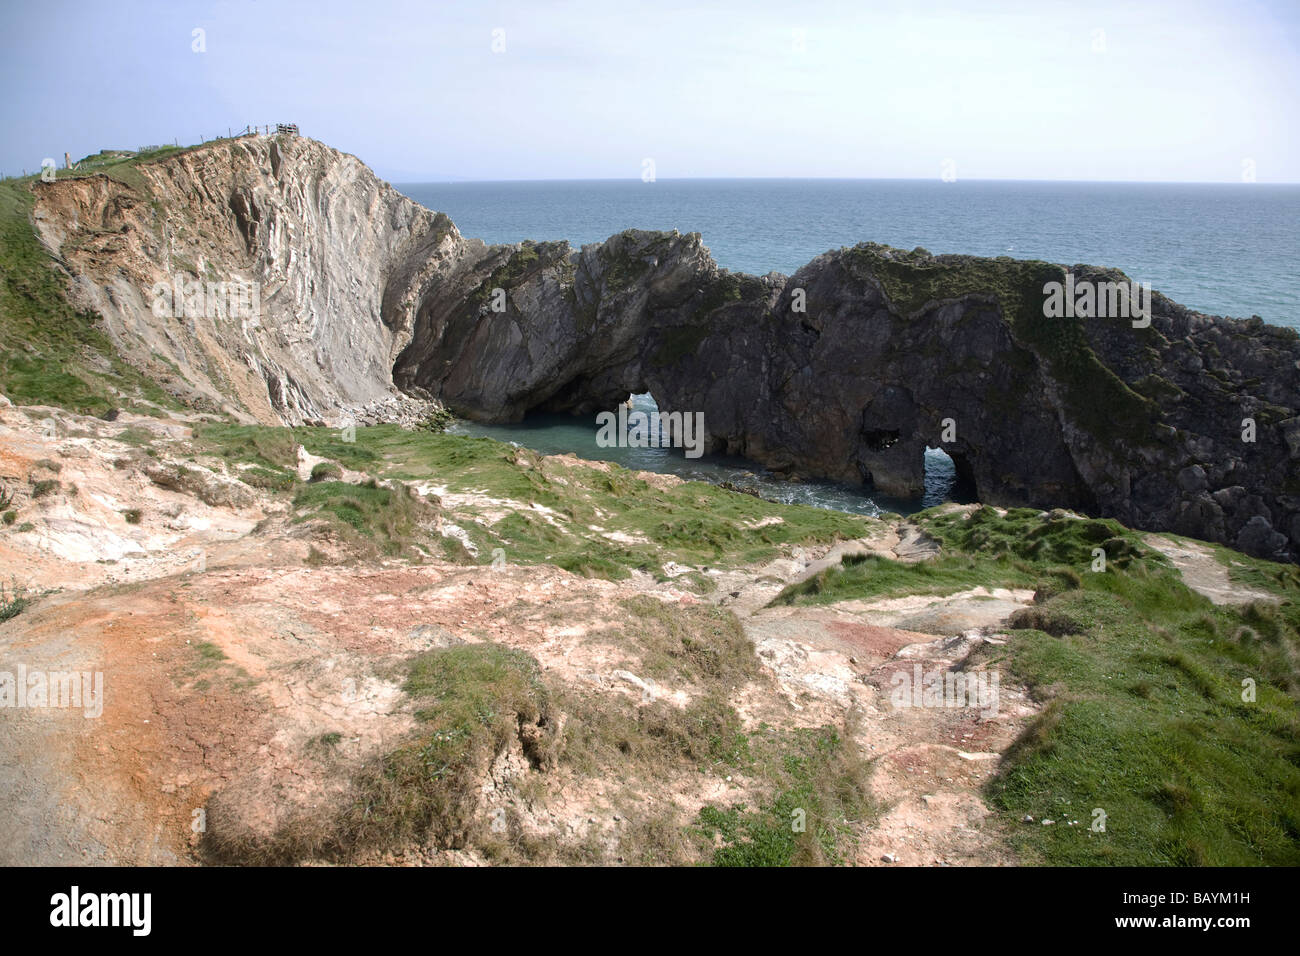 Stair Hole, Dorset, England - Stock Image